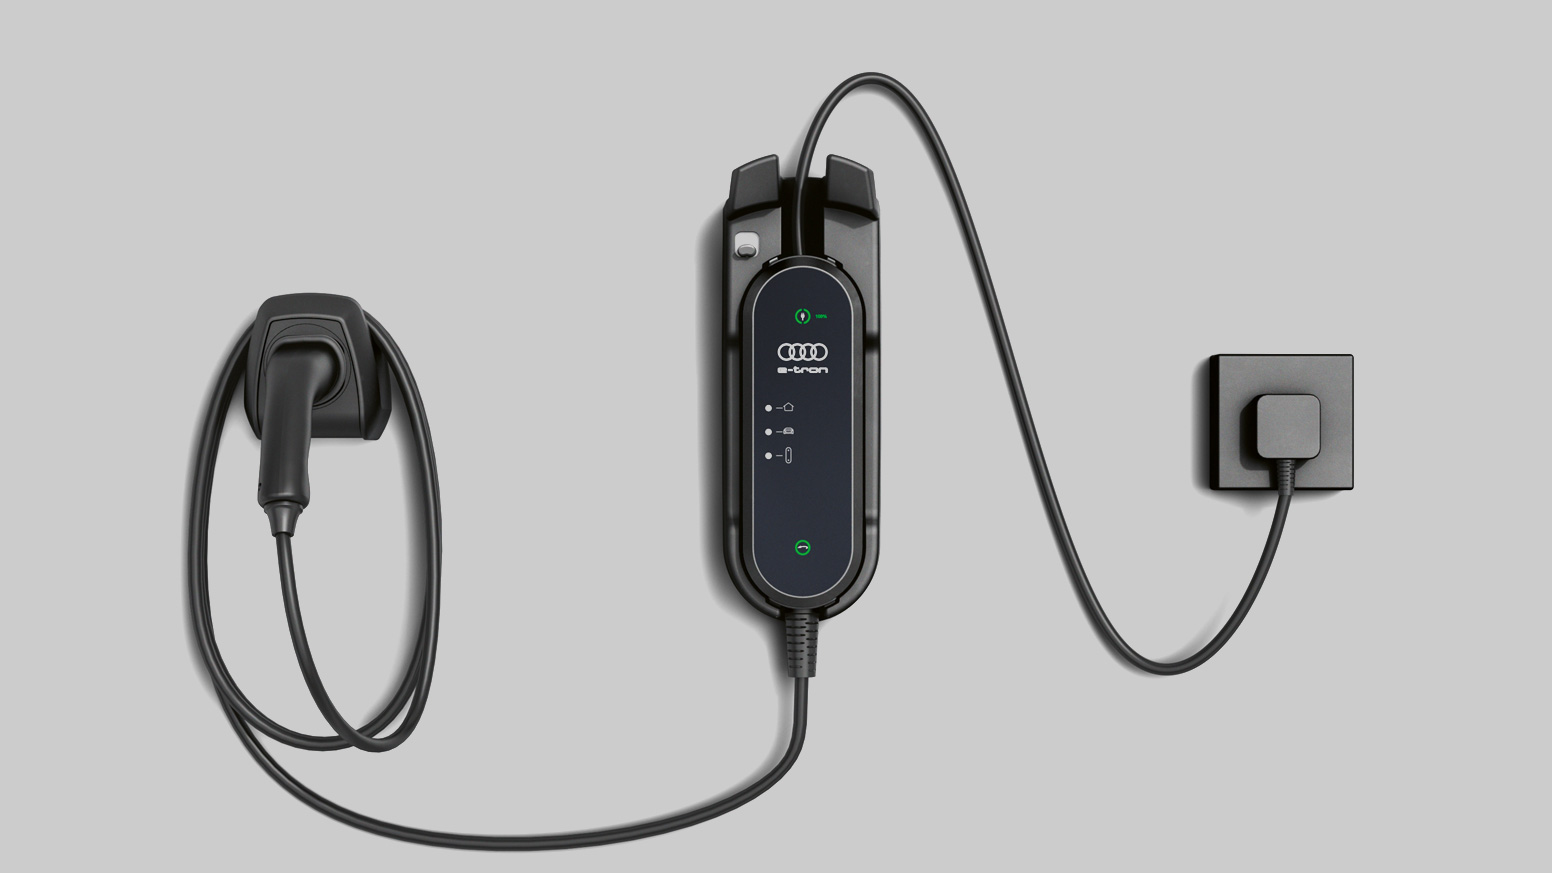 Review: rating OEM's EV charging cords (Tesla, Audi get A's; GM, Jaguar fail)